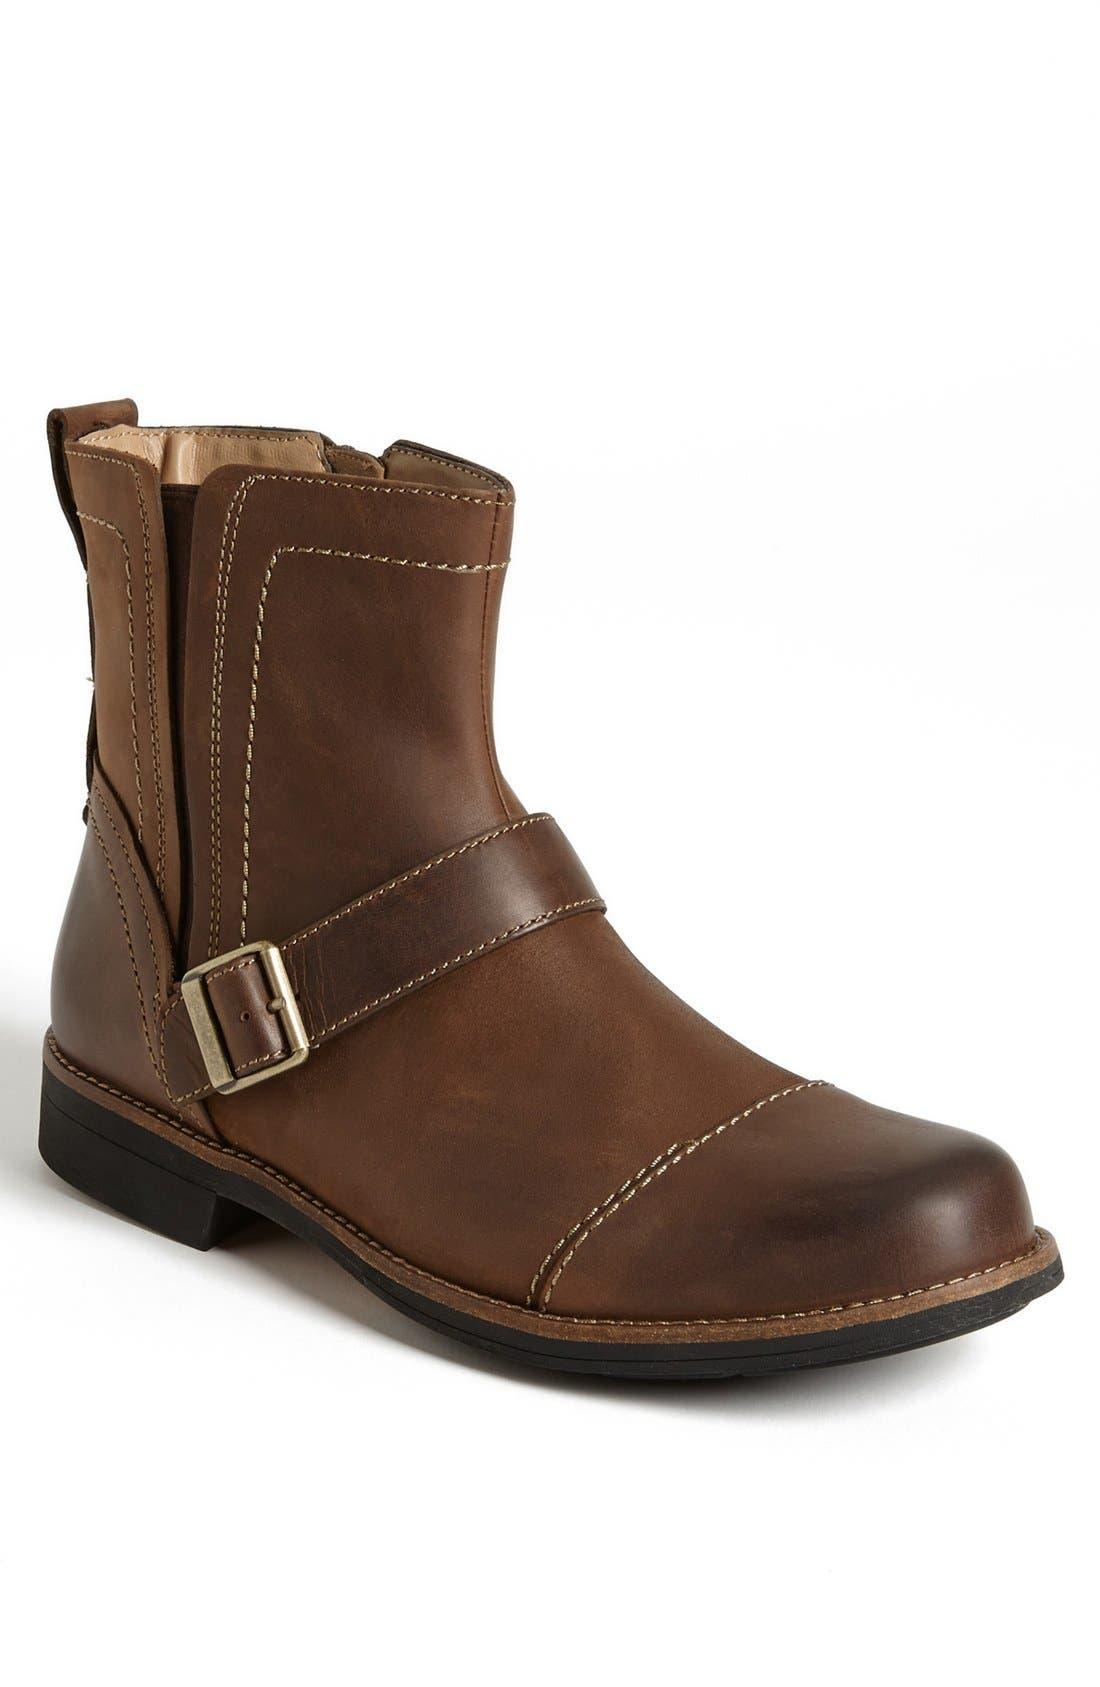 Alternate Image 1 Selected - Clarks® 'Meldon Strap' Zip Boot